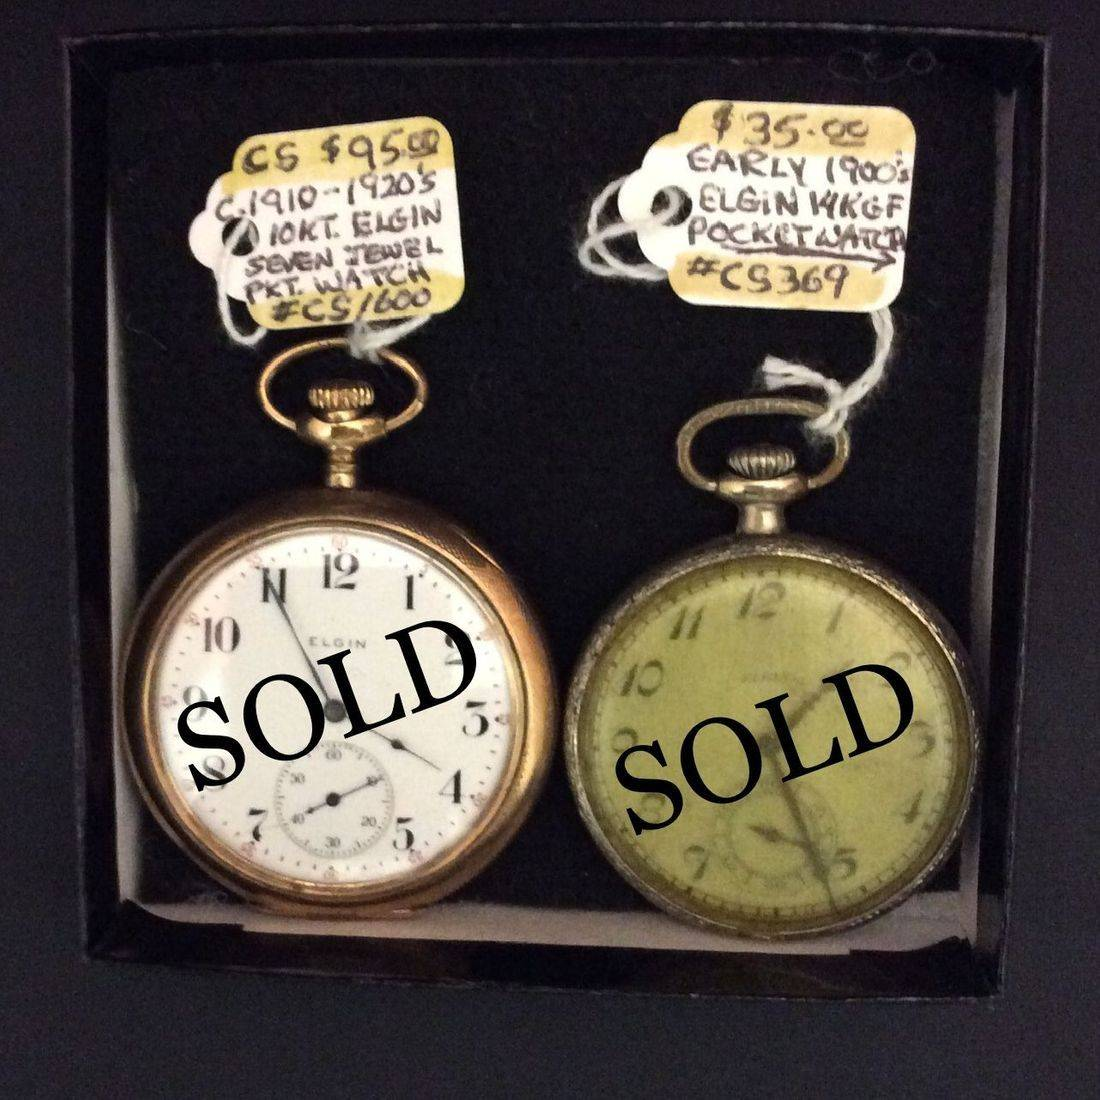 C. 1910-1920's, 10 Kt. Elgin, Seven Jewel, Pocket Watch  $95,  Early 1900's, 14 KGF Elgin, Pocket Watch  $35.00